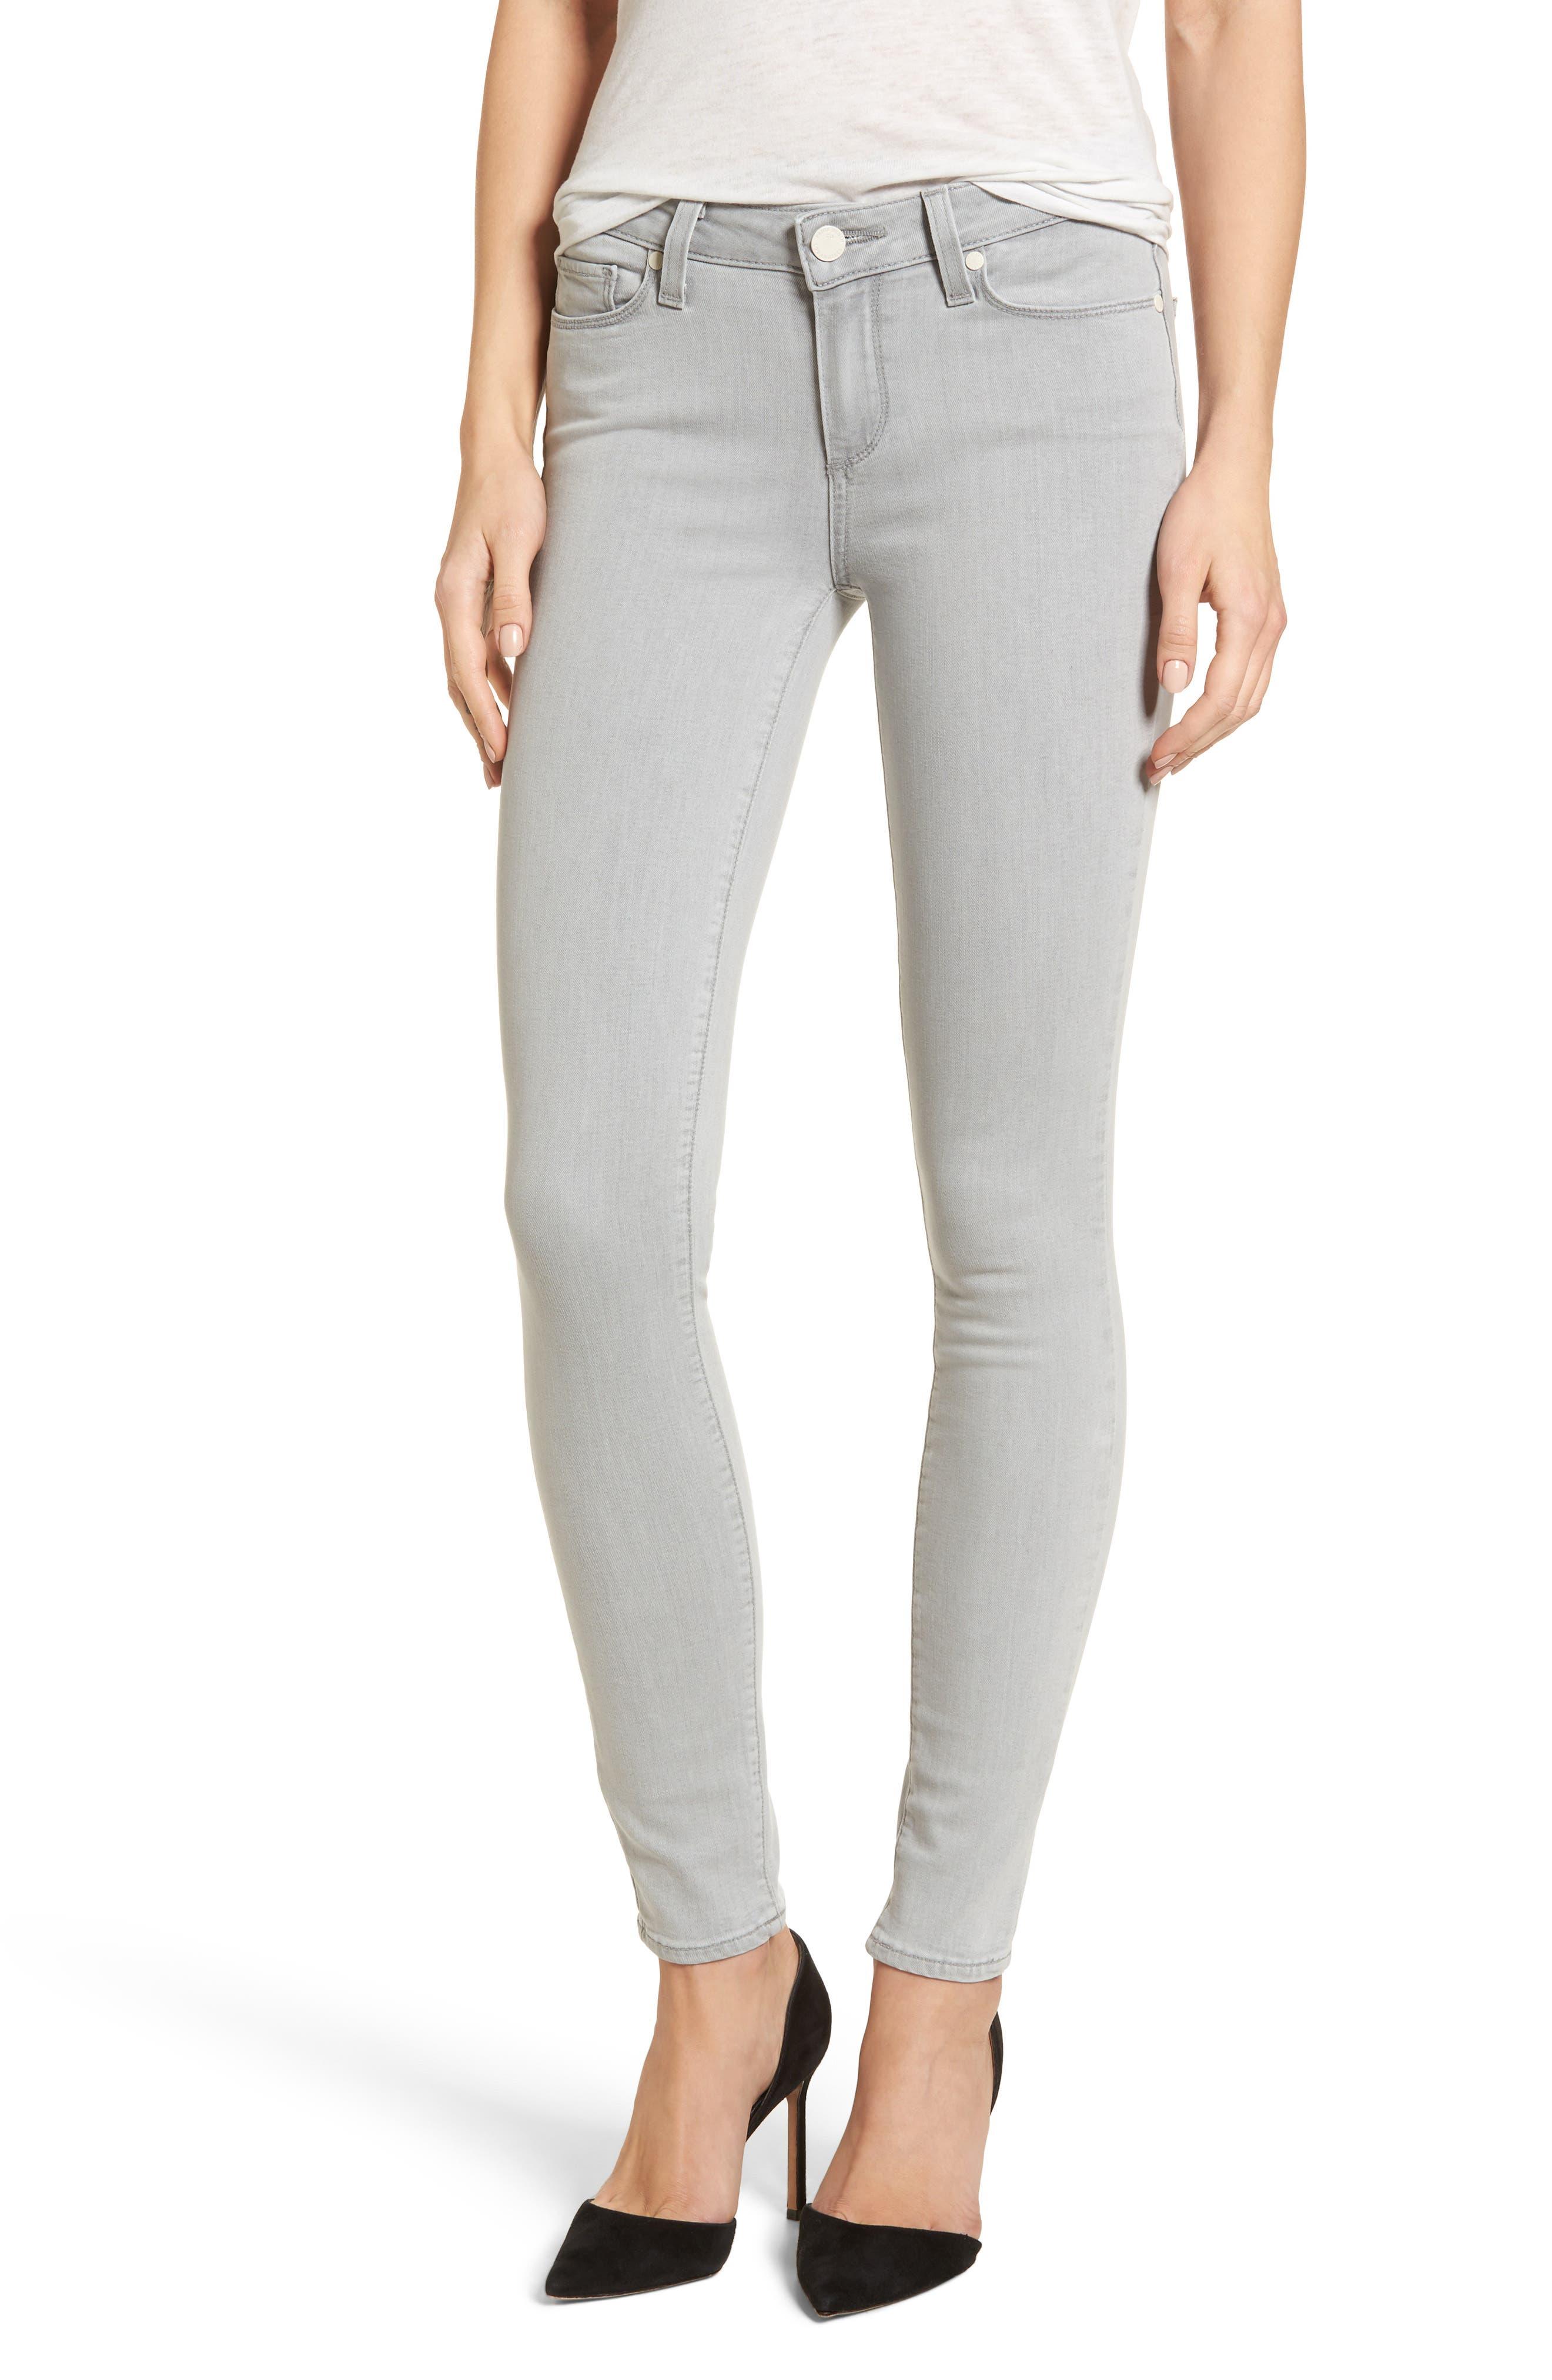 Transcend - Verdugo Ultra Skinny Jeans,                         Main,                         color, Whisper Grey